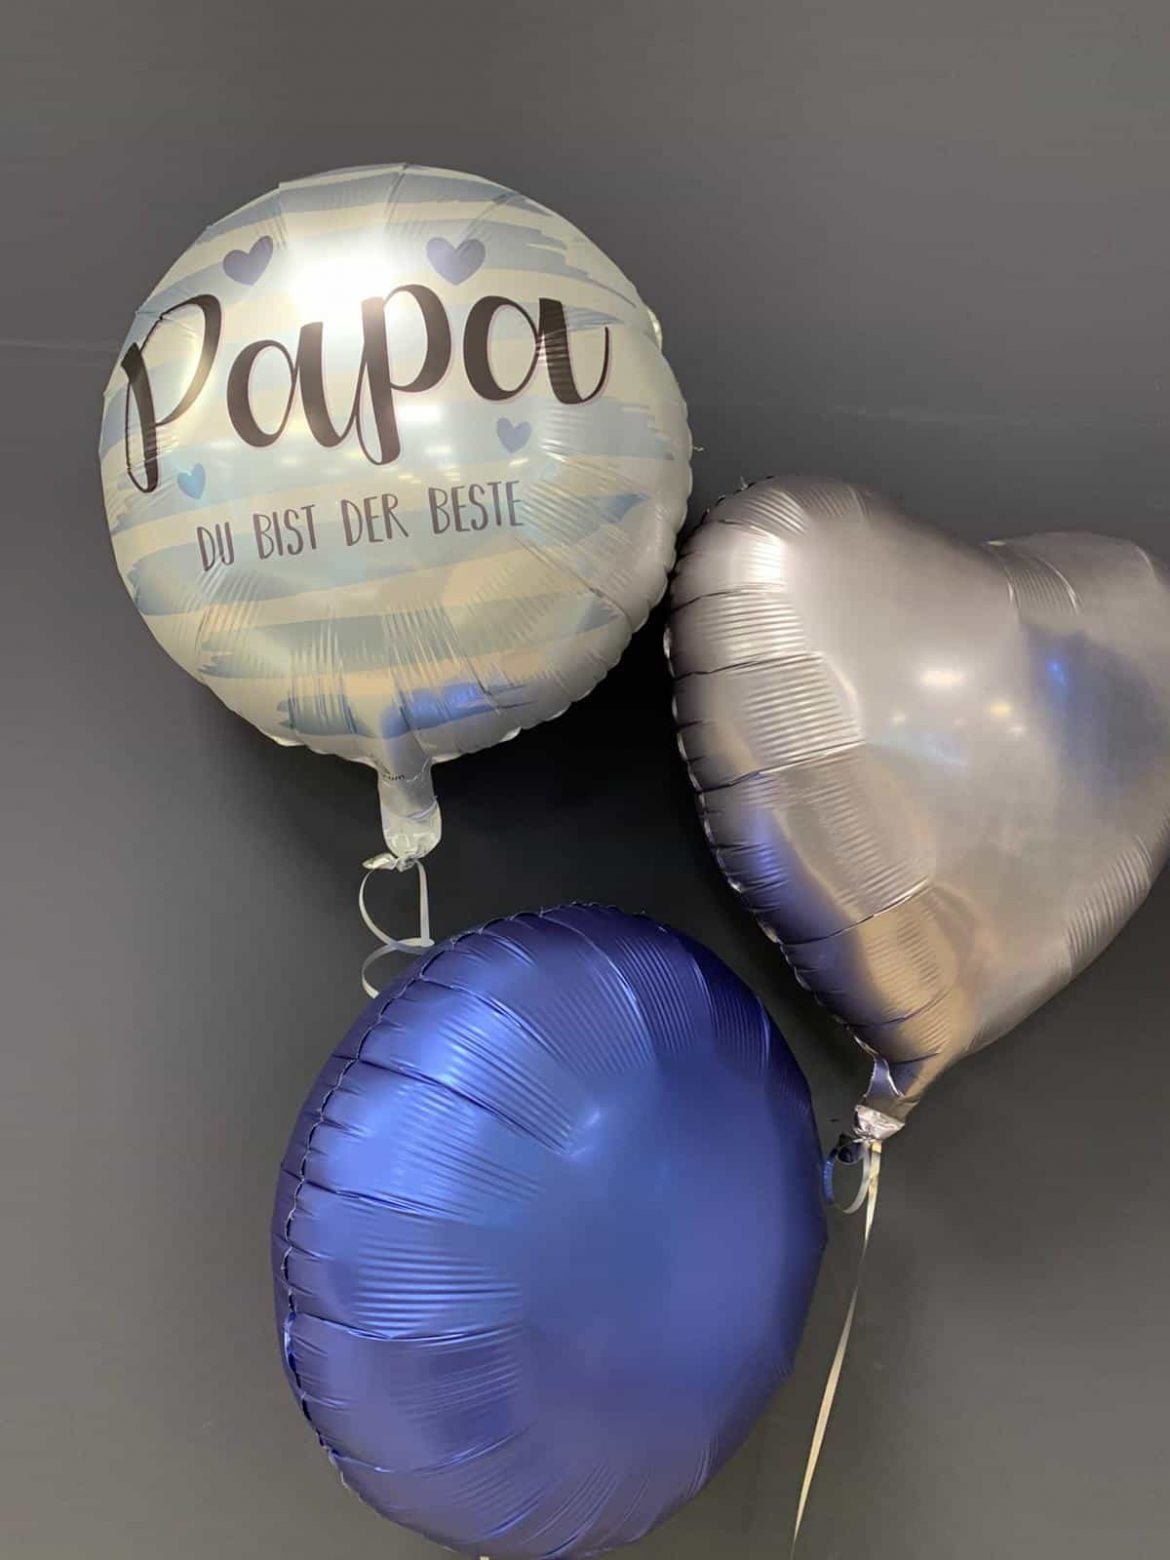 Papa Du bist der Beste<br />Folien-Ballon € 5,50<br />Dekoballon € 4,50 1